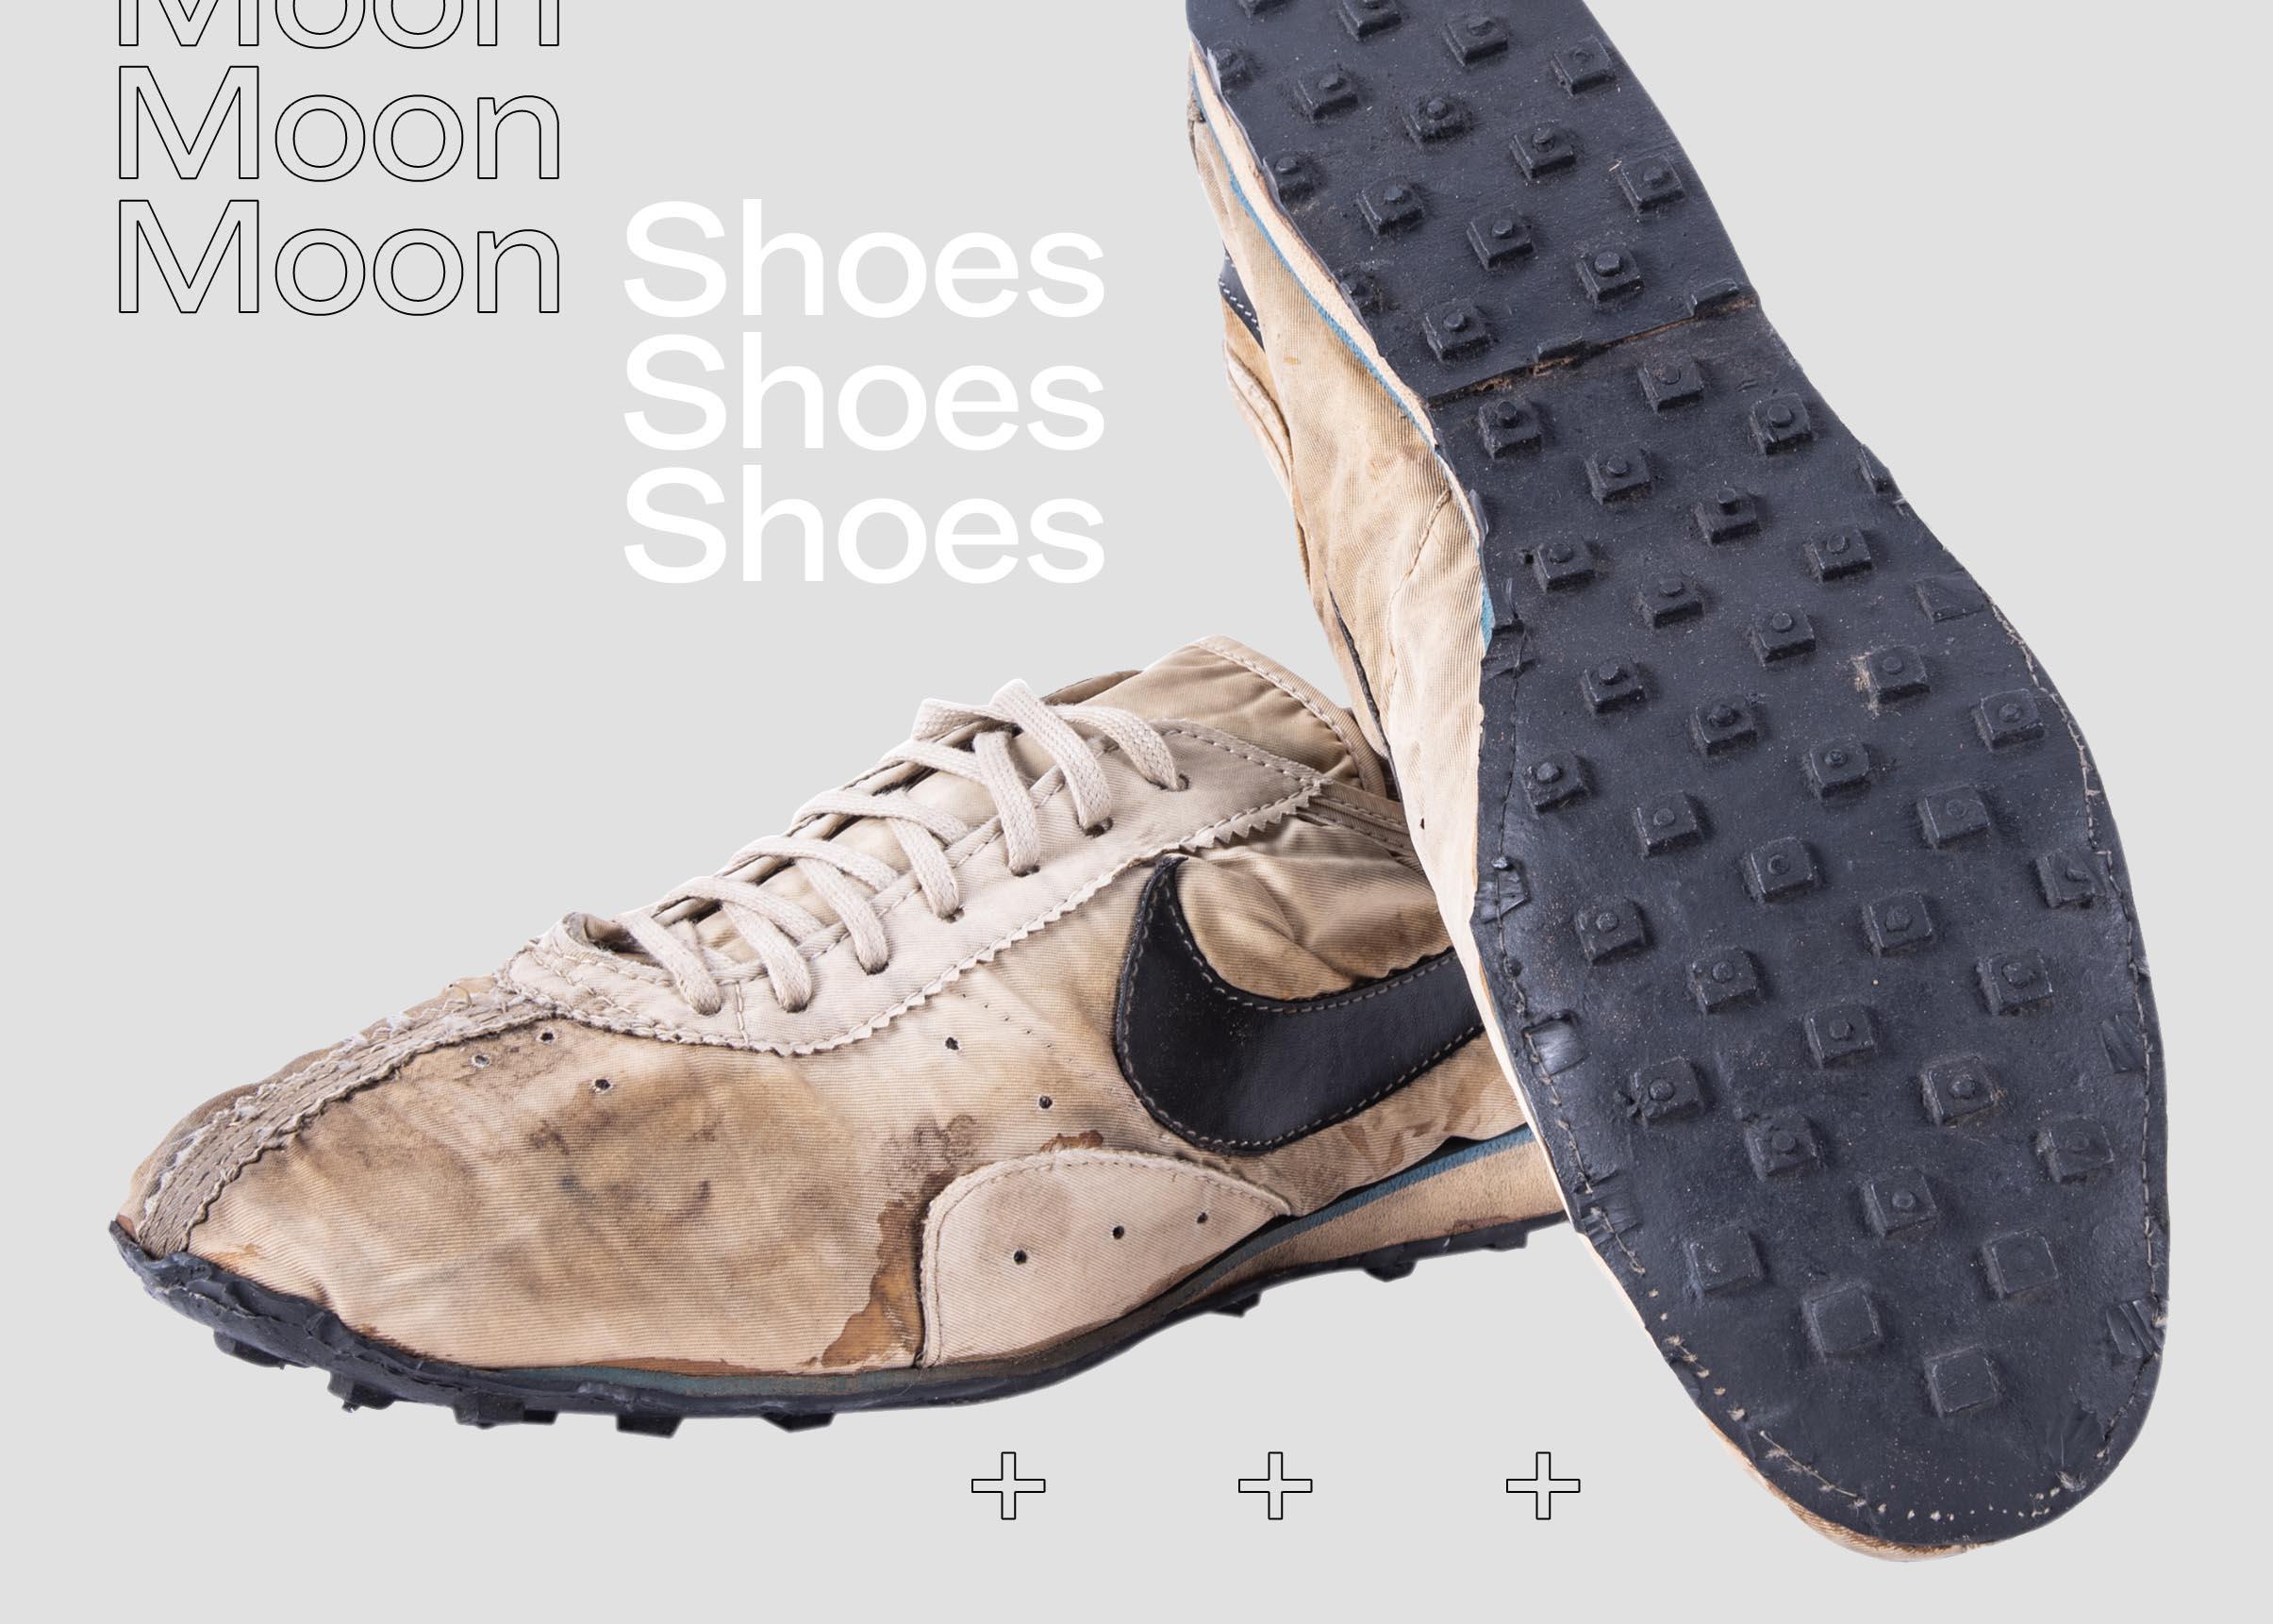 nike moon boots